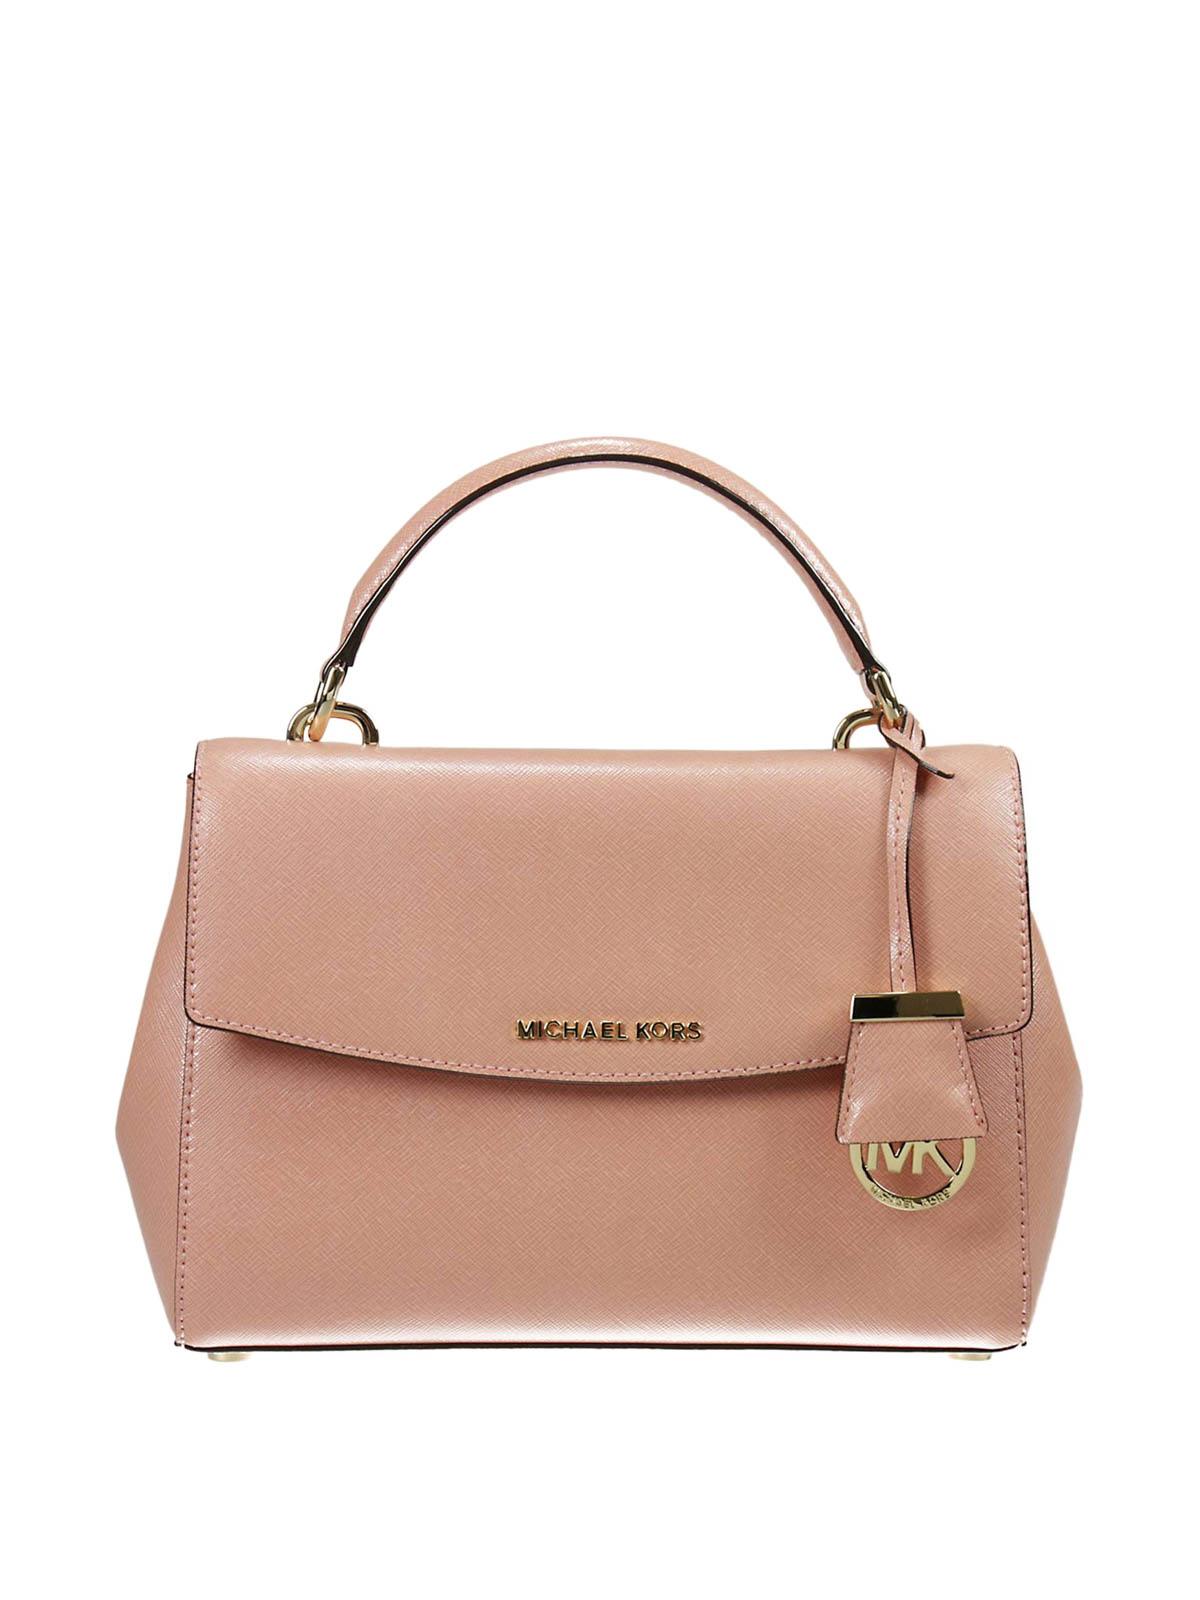 1e537e76201d9 Michael Kors - Ava small saffiano satchel - cross body bags ...